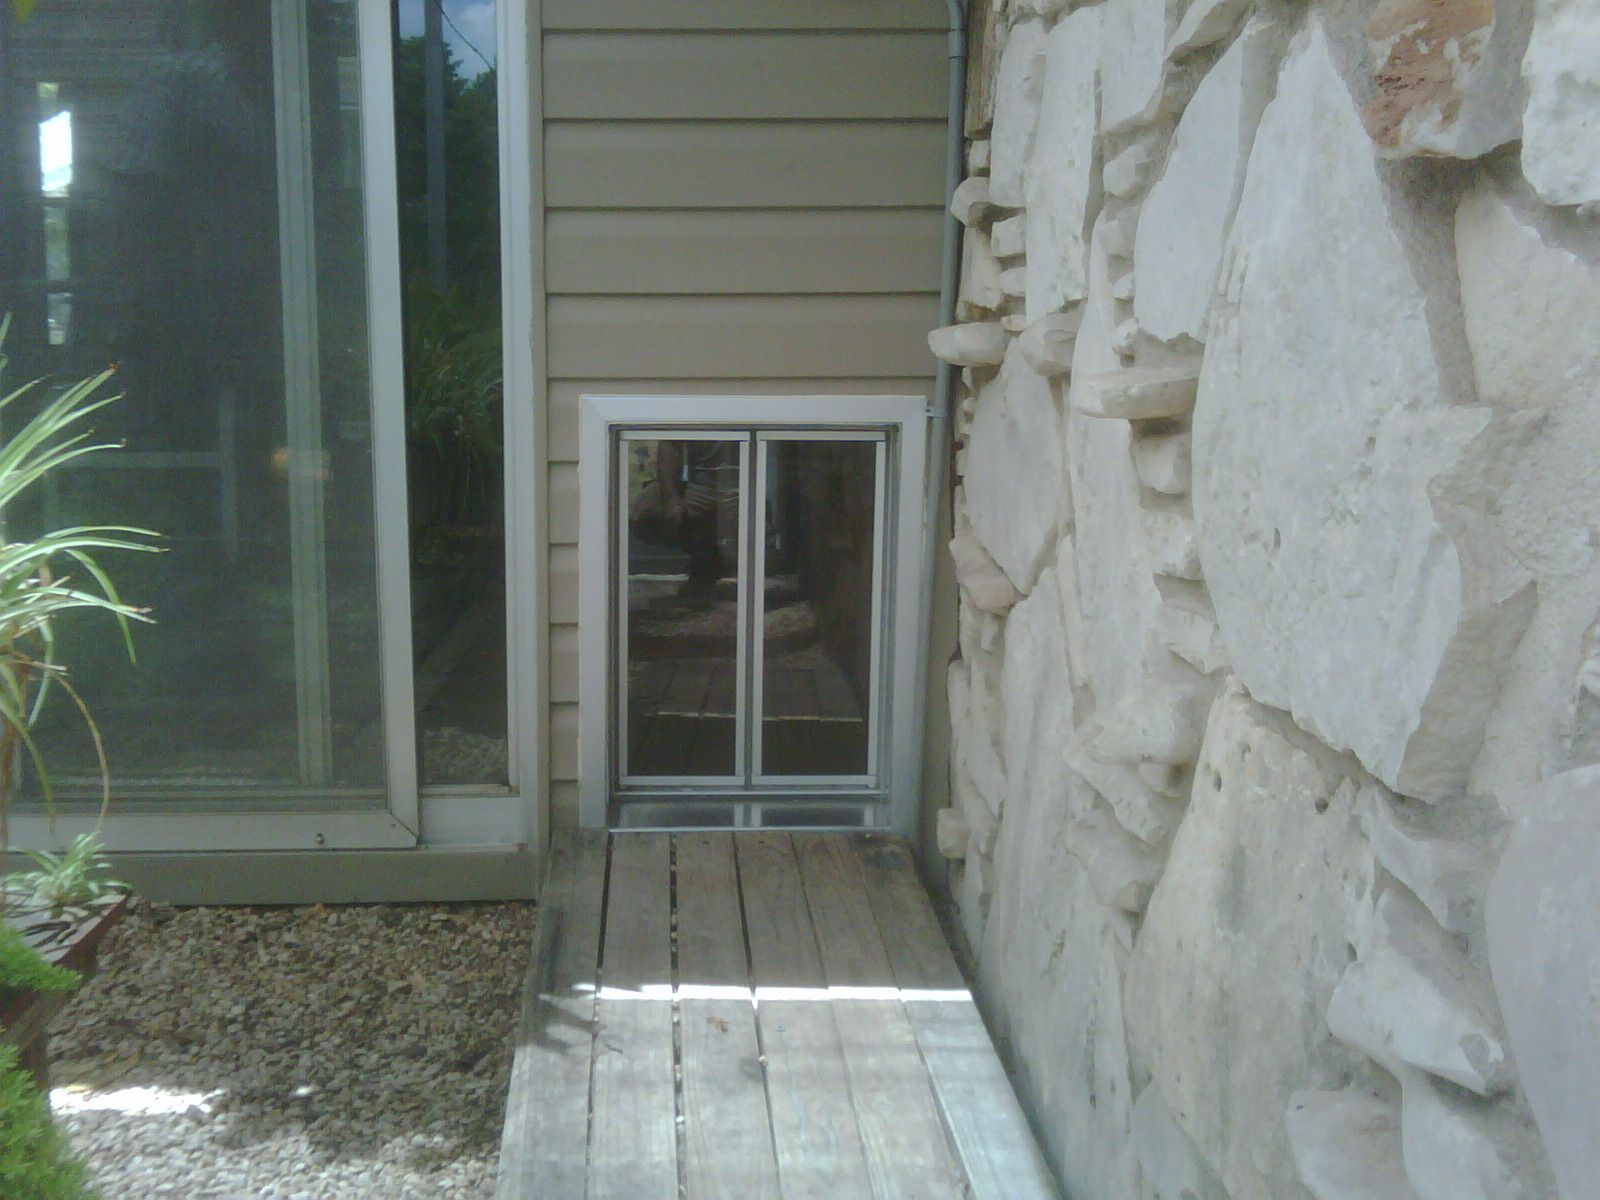 PlexiDor XL dog door installation, courtesy of Alamo Pet